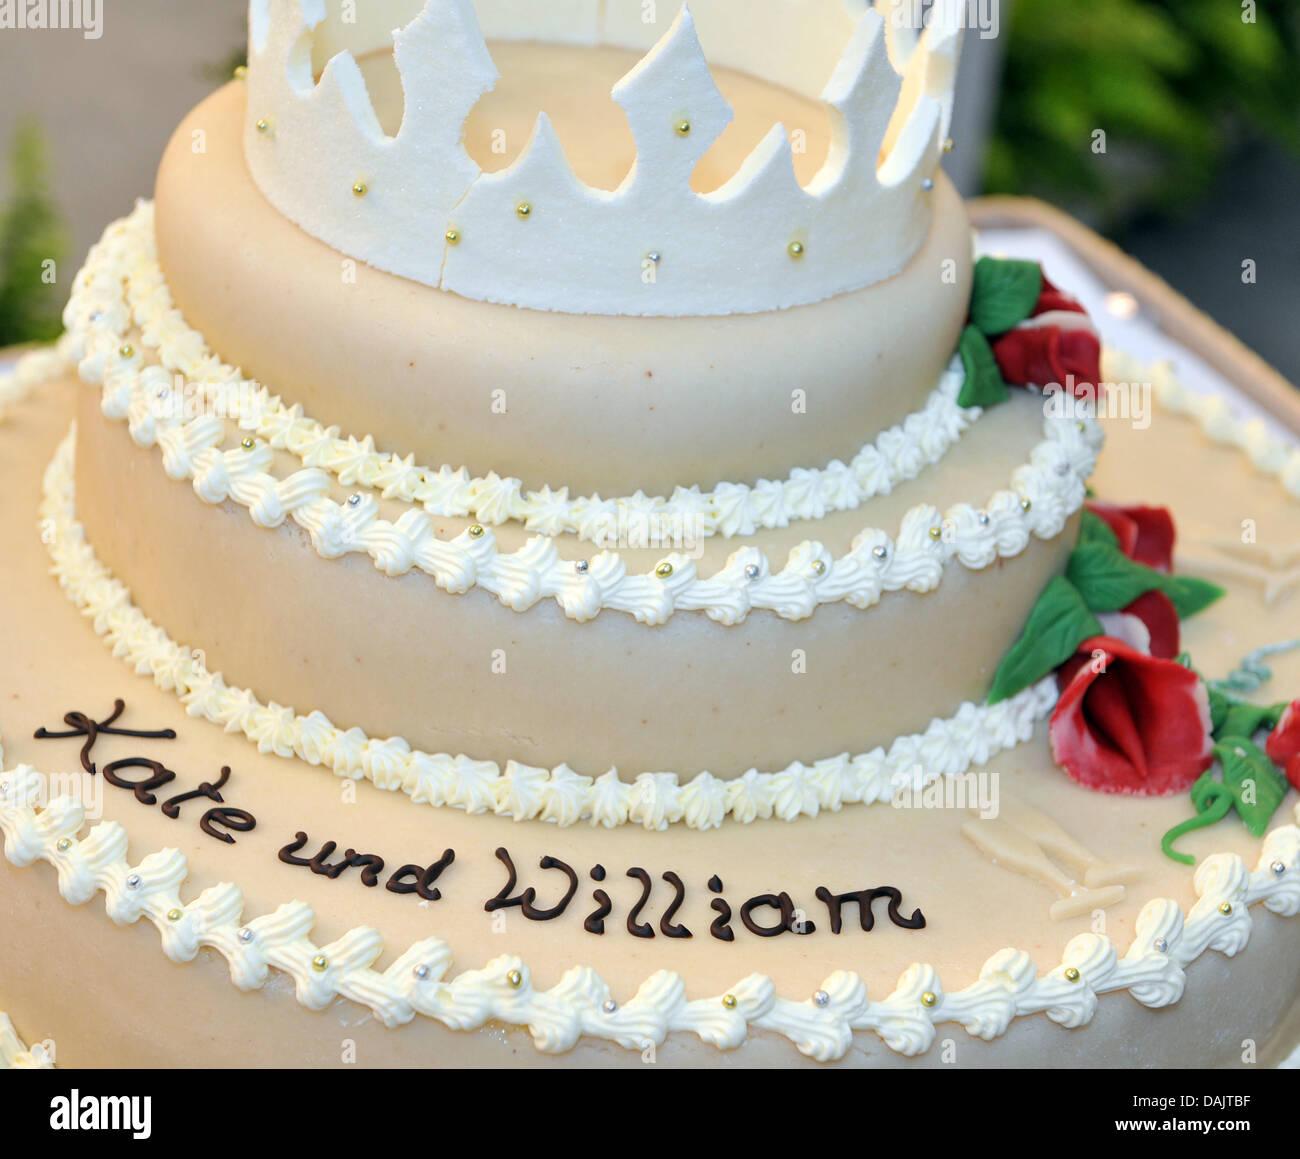 The Leipzig Fair presents a 35 kilogram heavy wedding cake